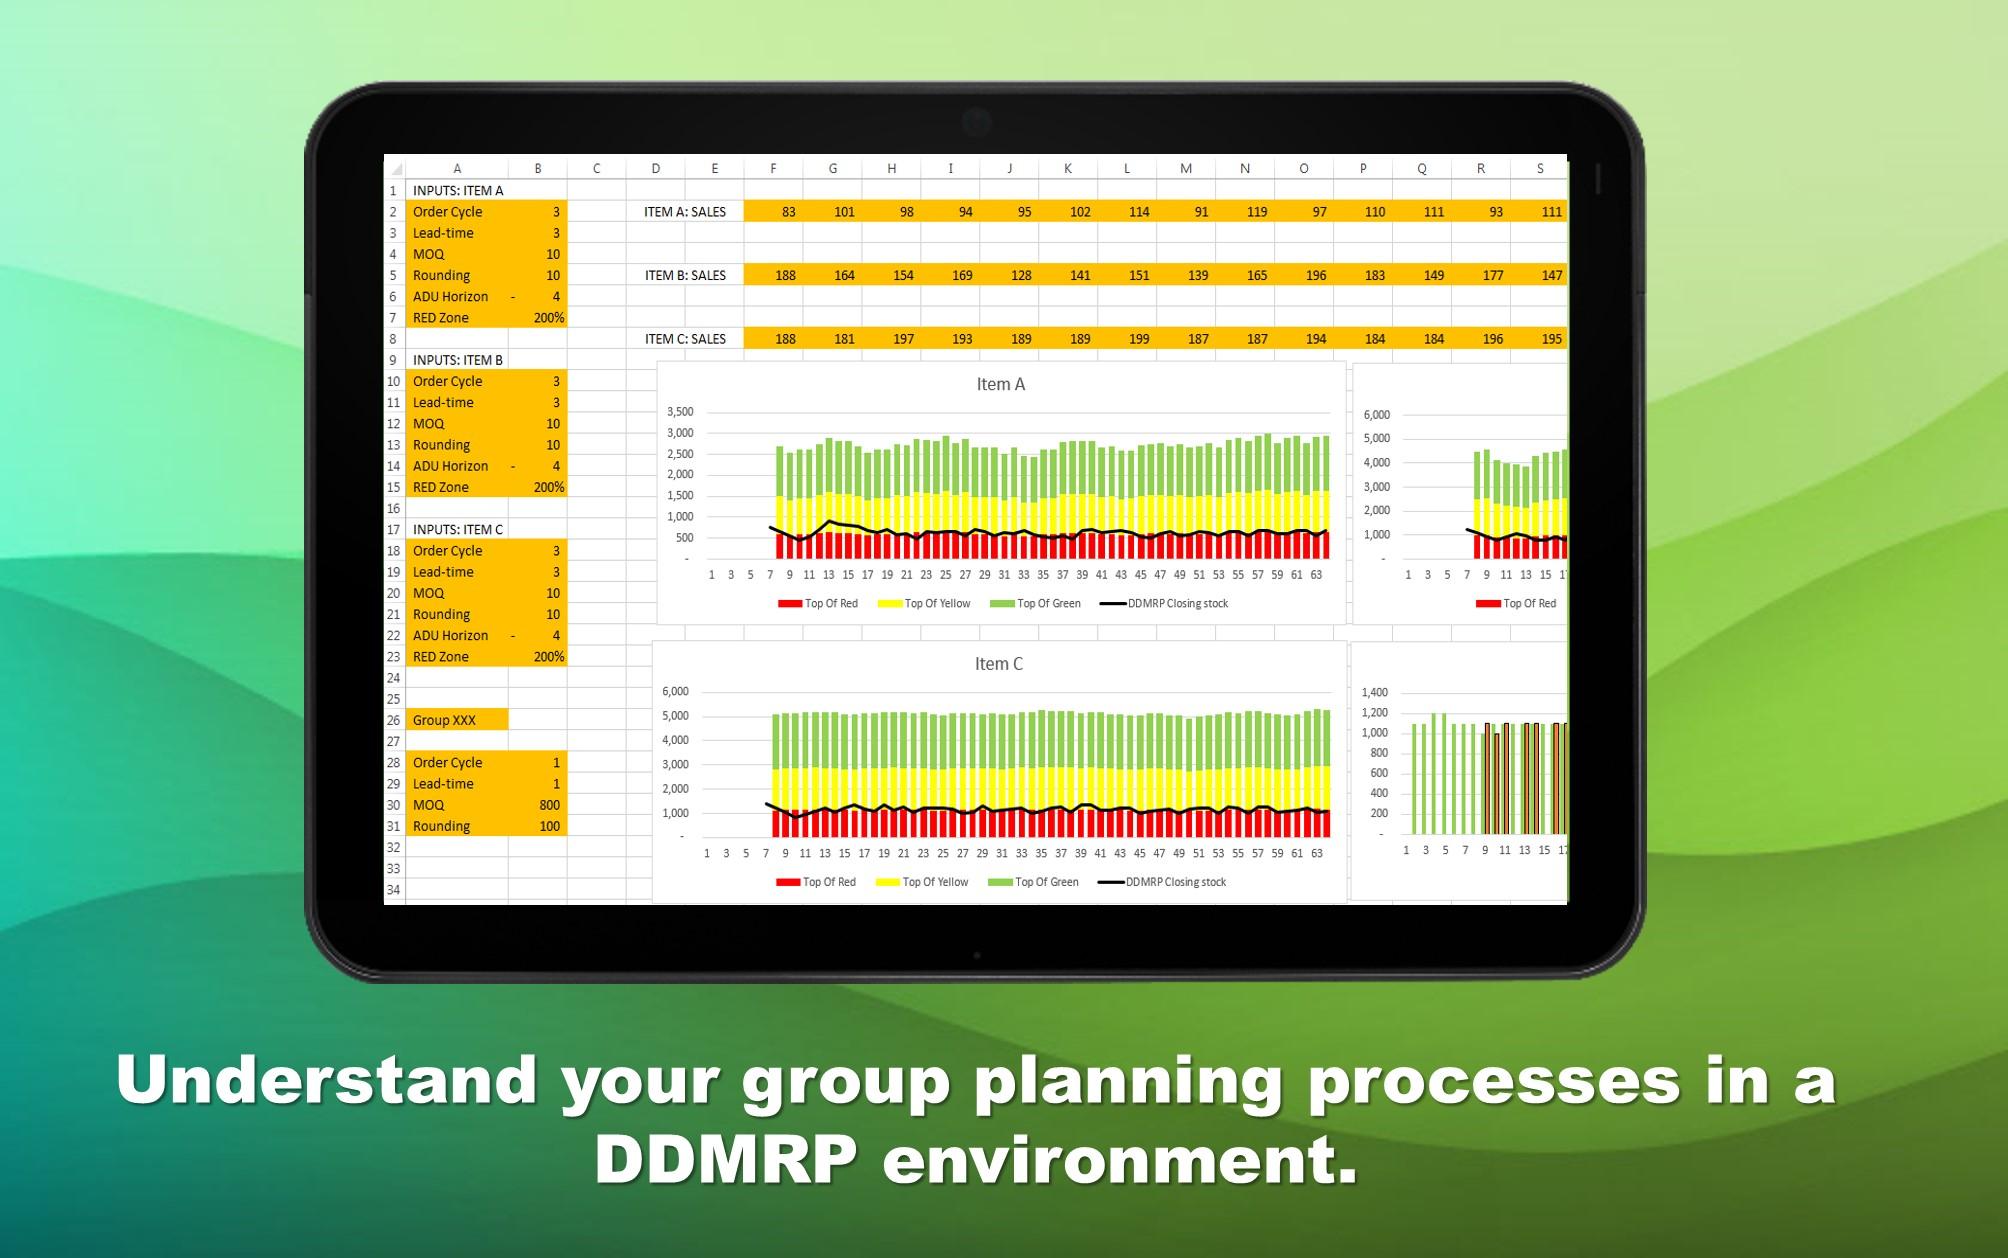 DDMRP_Group_Planning_Excel.jpg